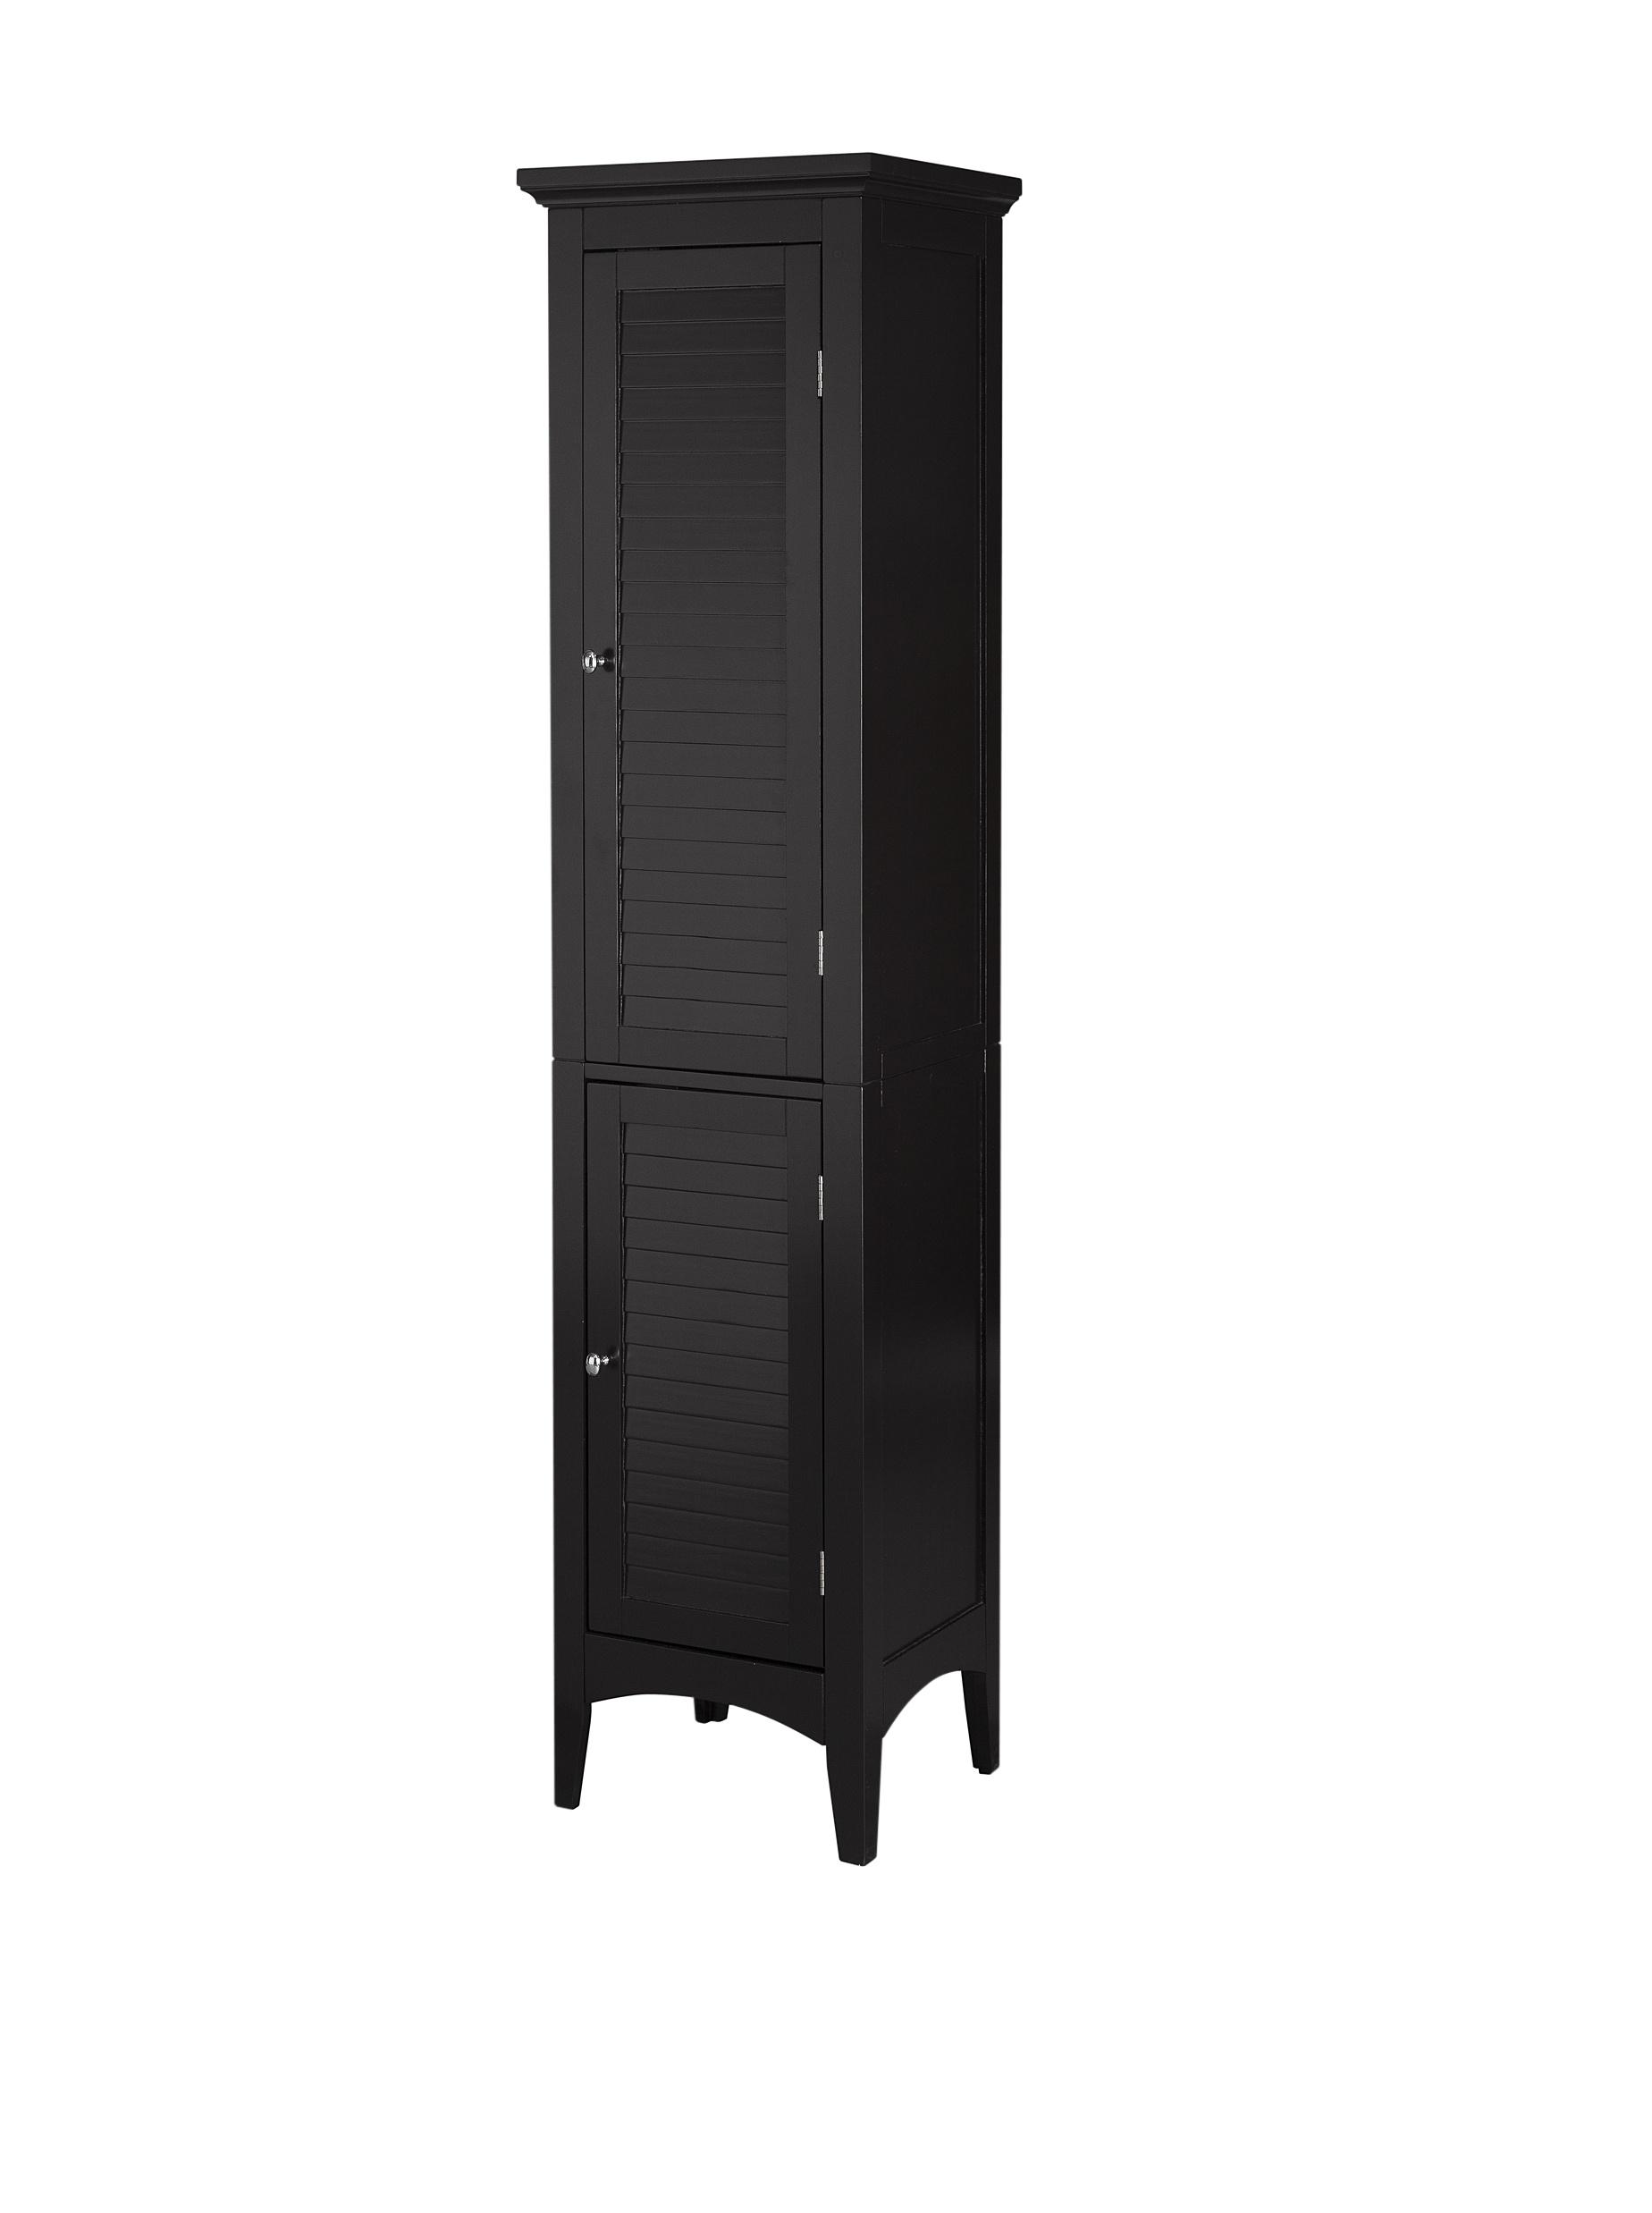 Elegant Home Fashions Slone Two-Shutter Door Linen Tower